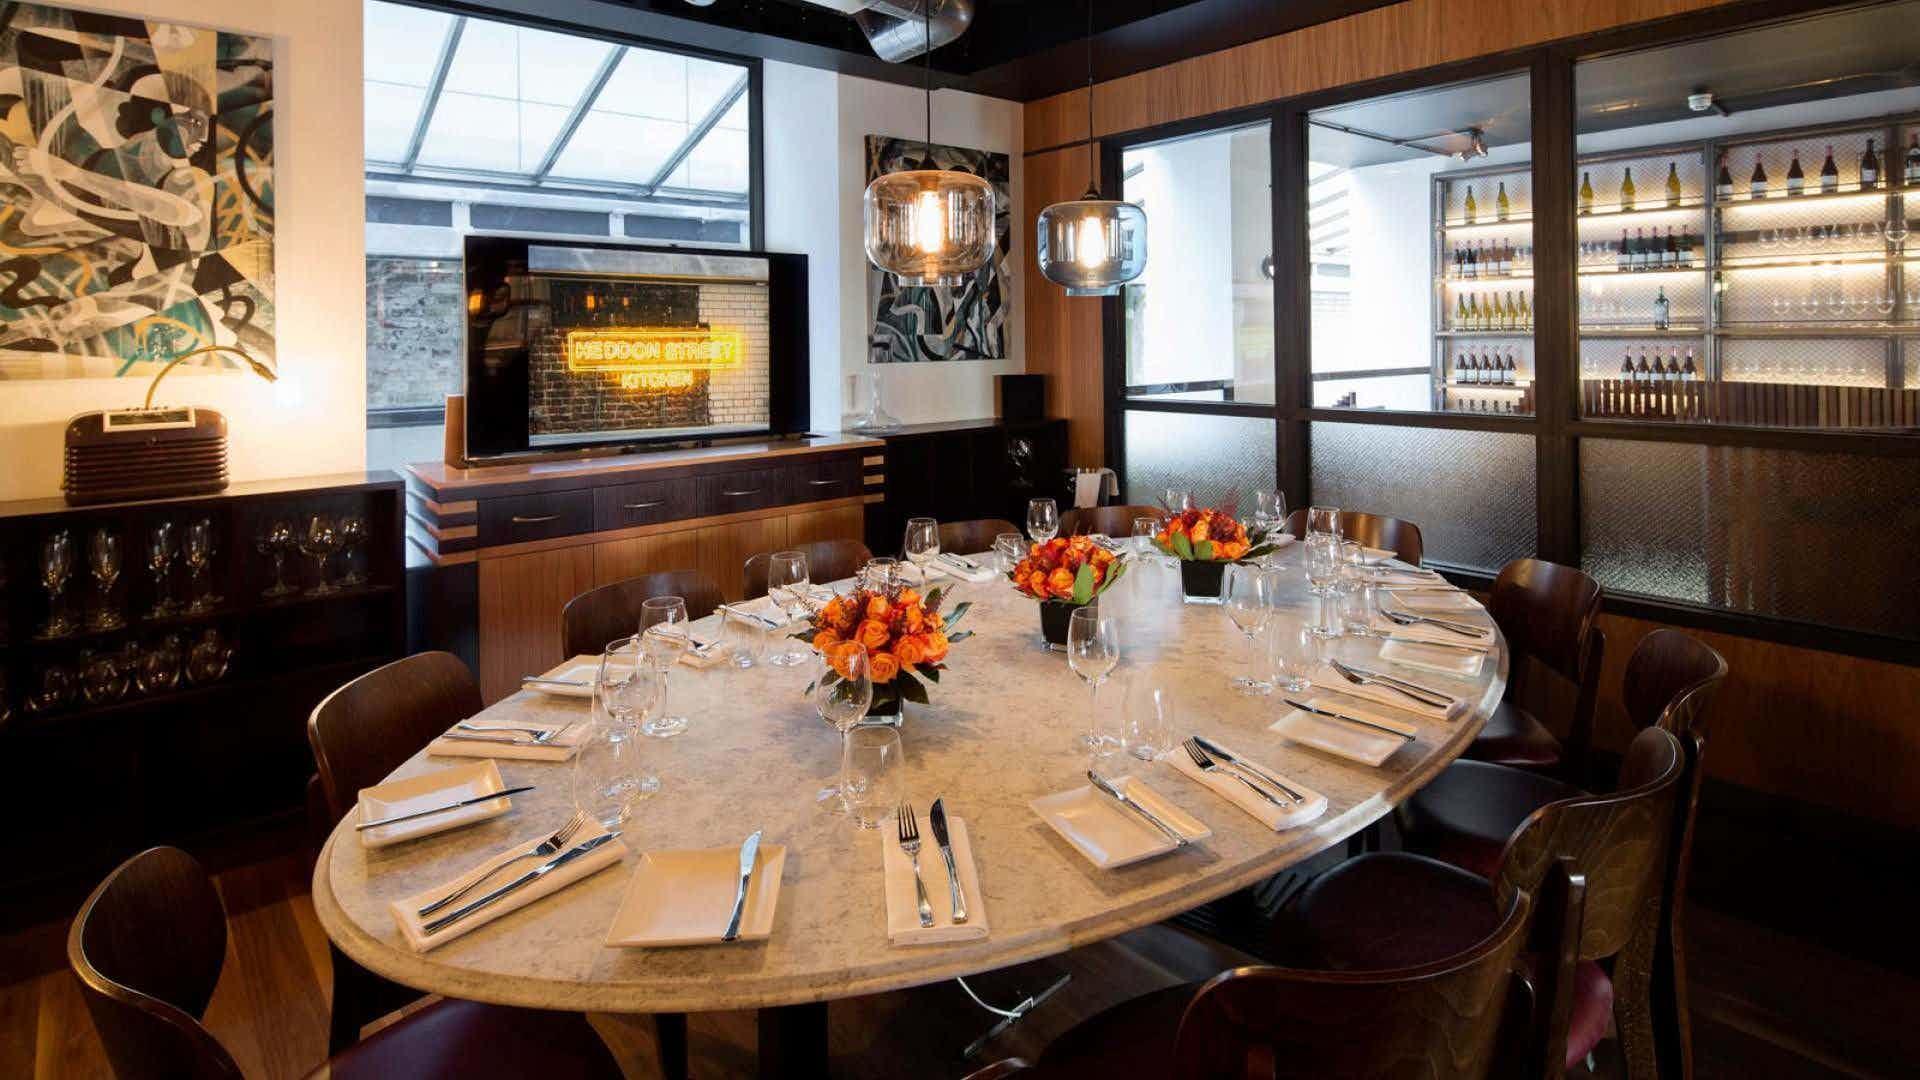 Private Dining Room, Heddon Street Kitchen